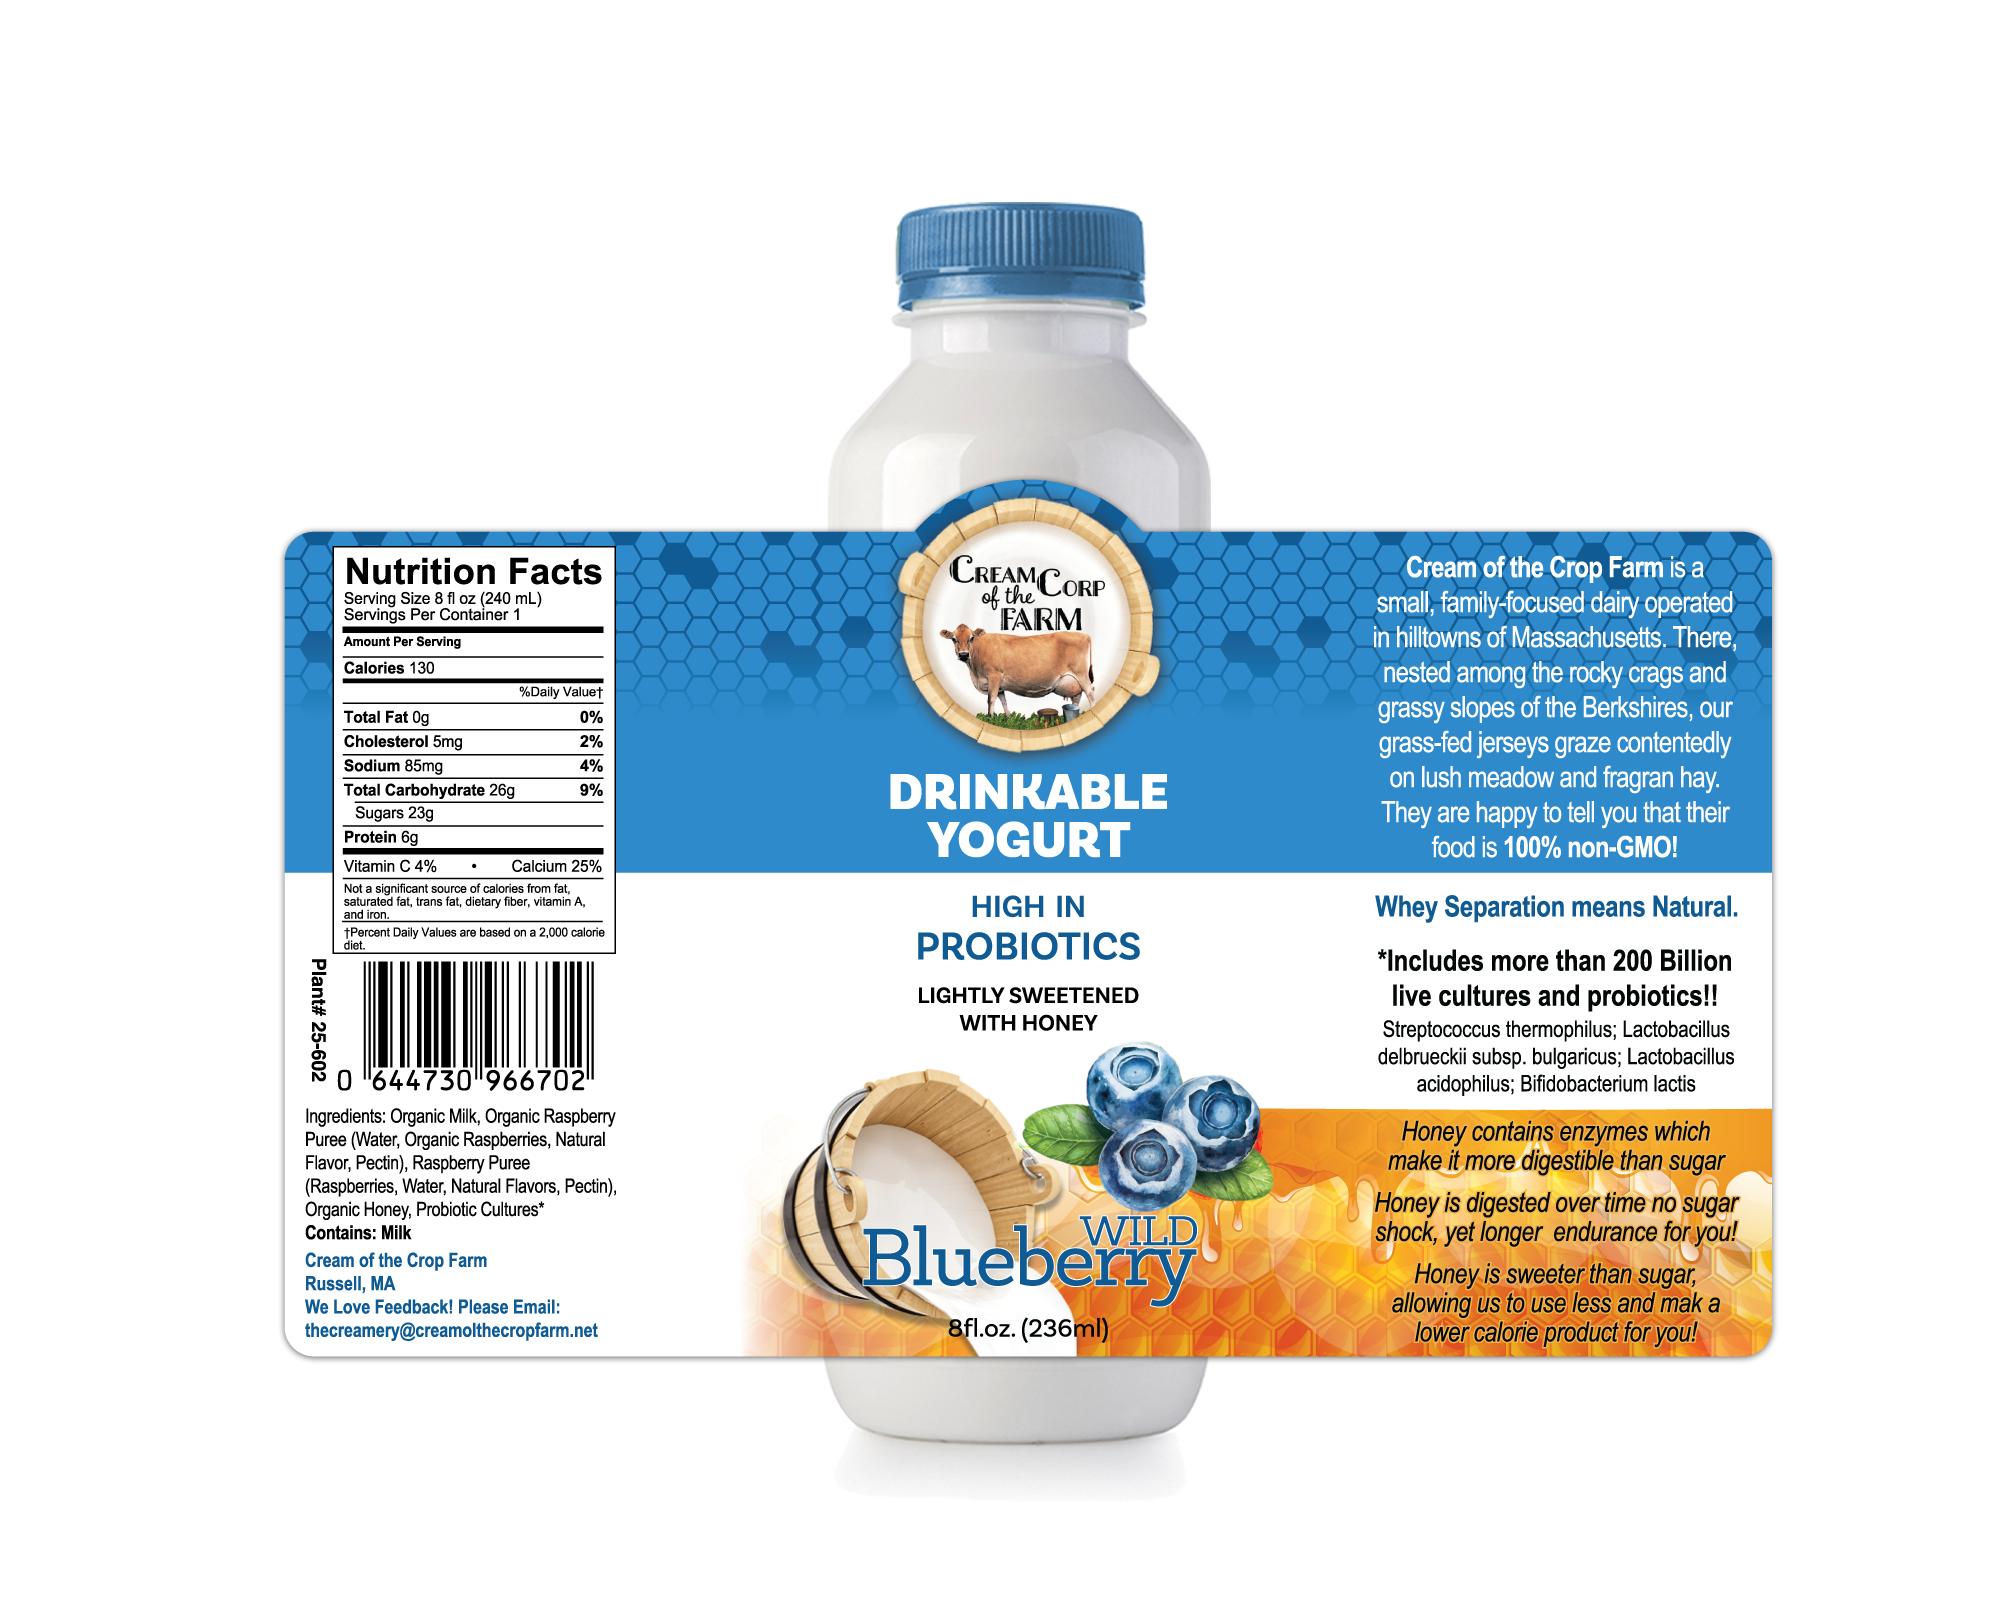 Cream of the Crop Drinkable Yogurt Label